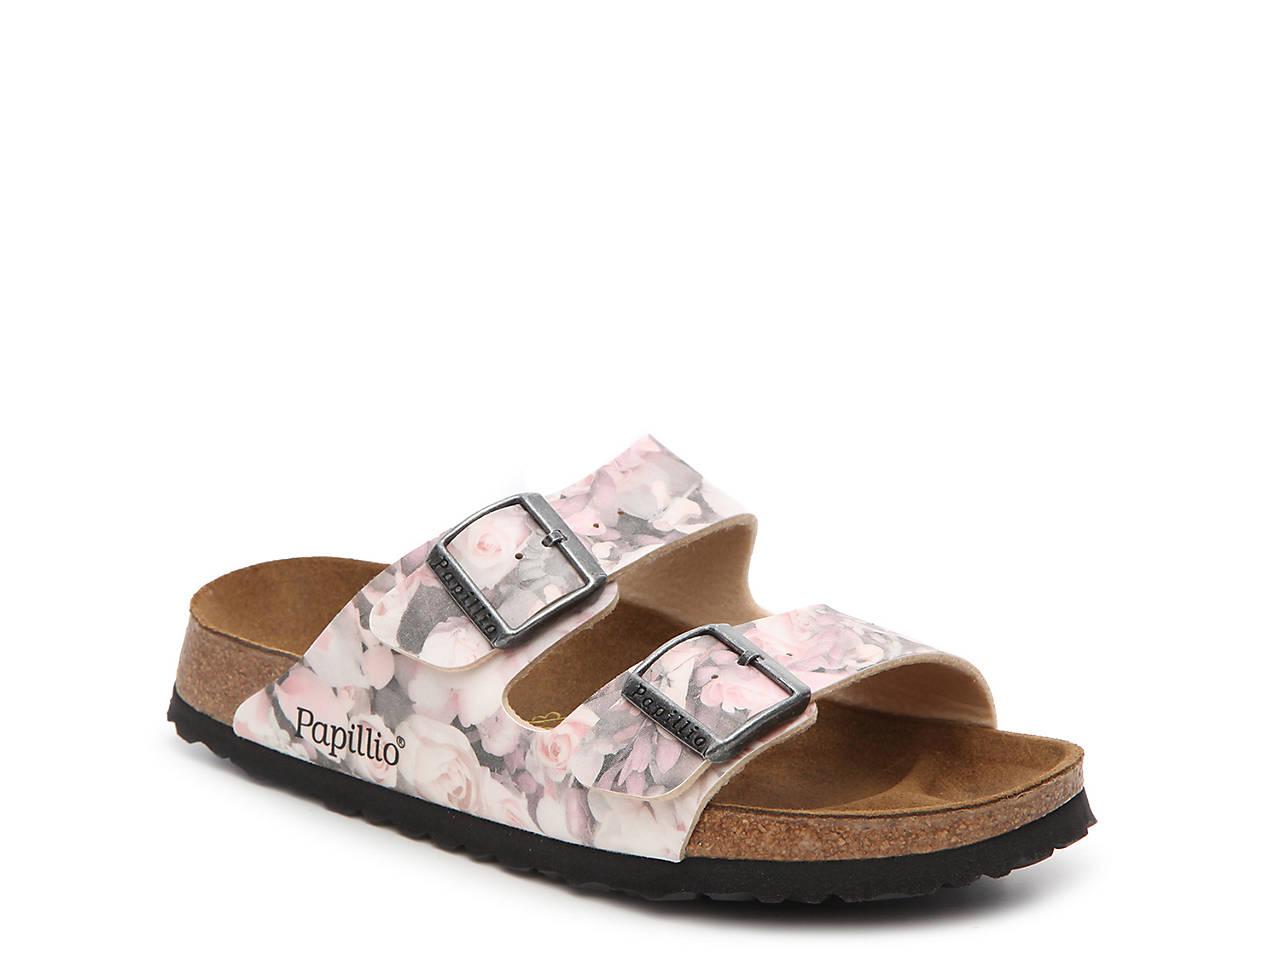 f995caa473dc Papillio by Birkenstock Arizona Silky Rose Flat Sandal Women s Shoes ...